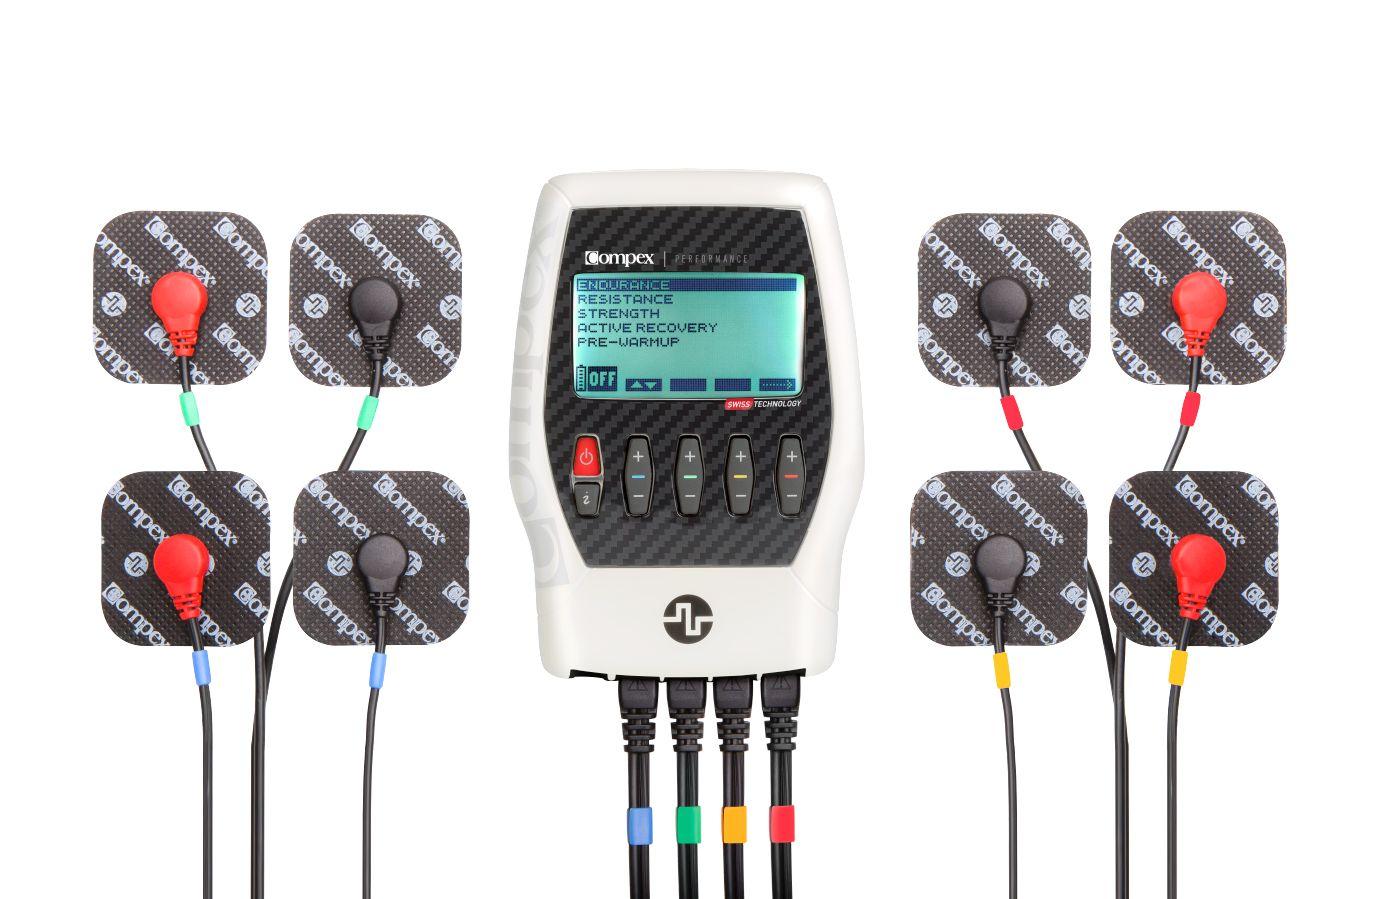 Compex Performance 2.0 Muscle Stimulator